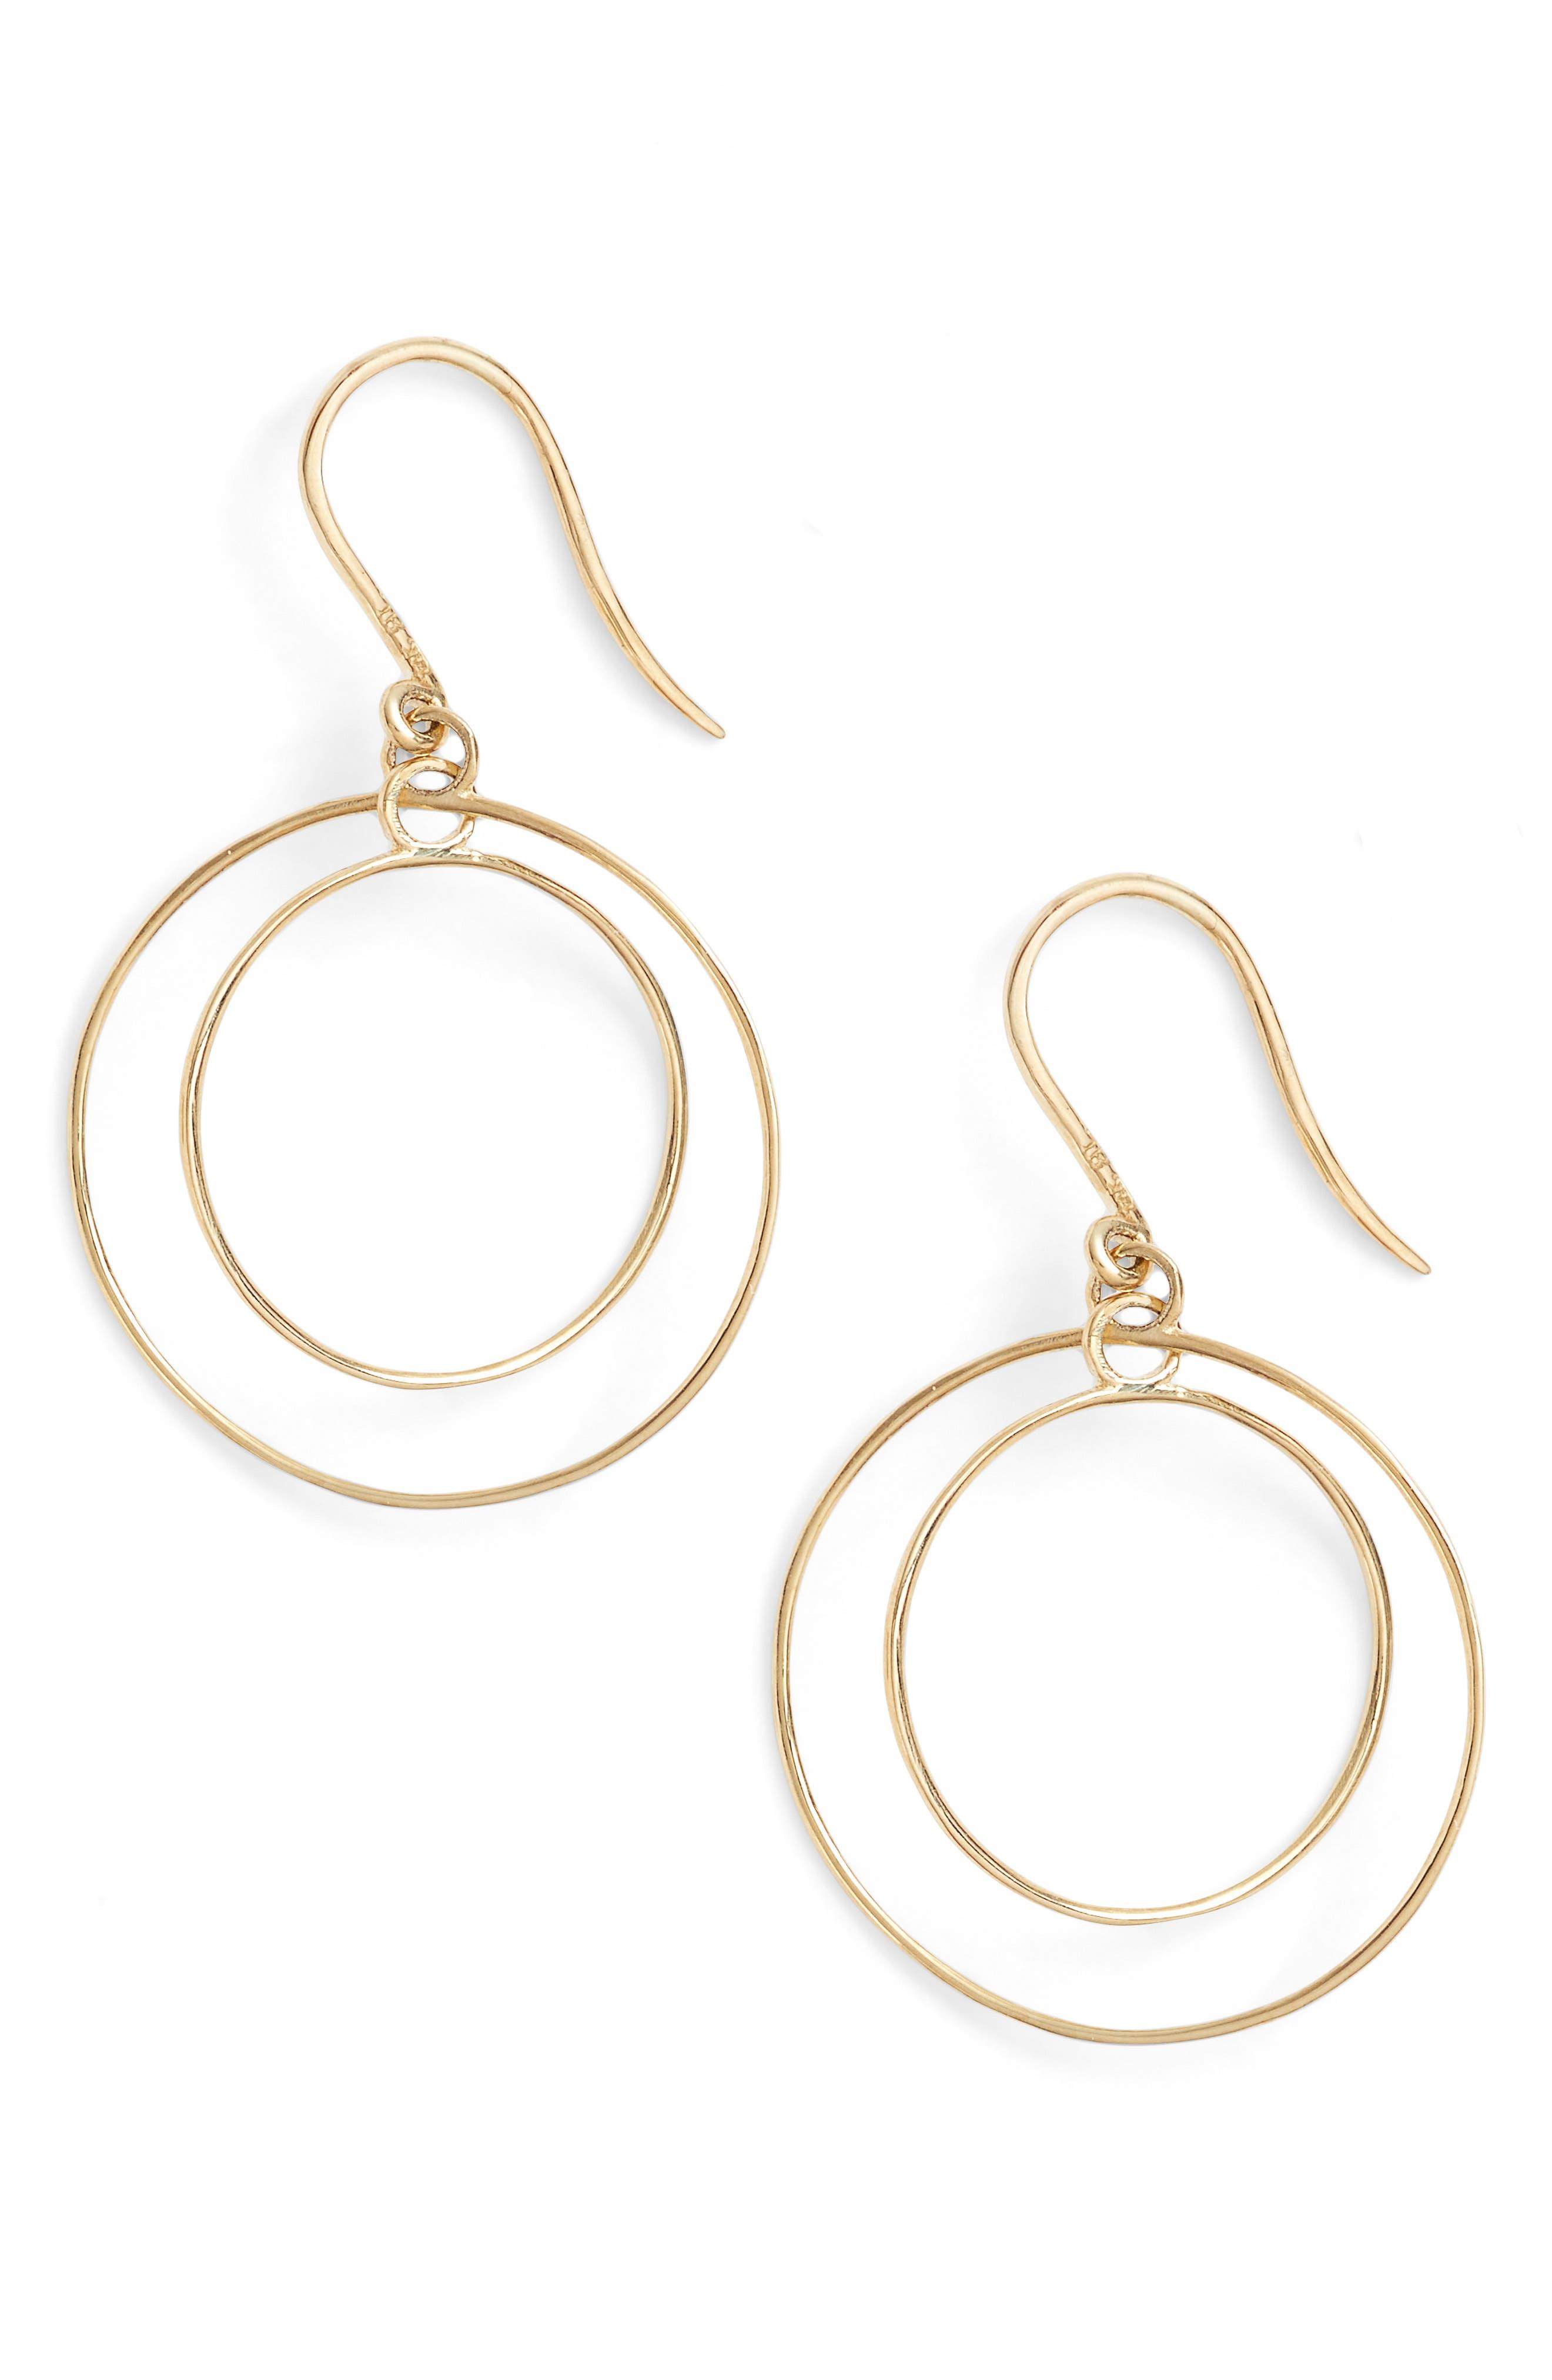 Double Circle Orbital Drop Earrings,                             Main thumbnail 1, color,                             710